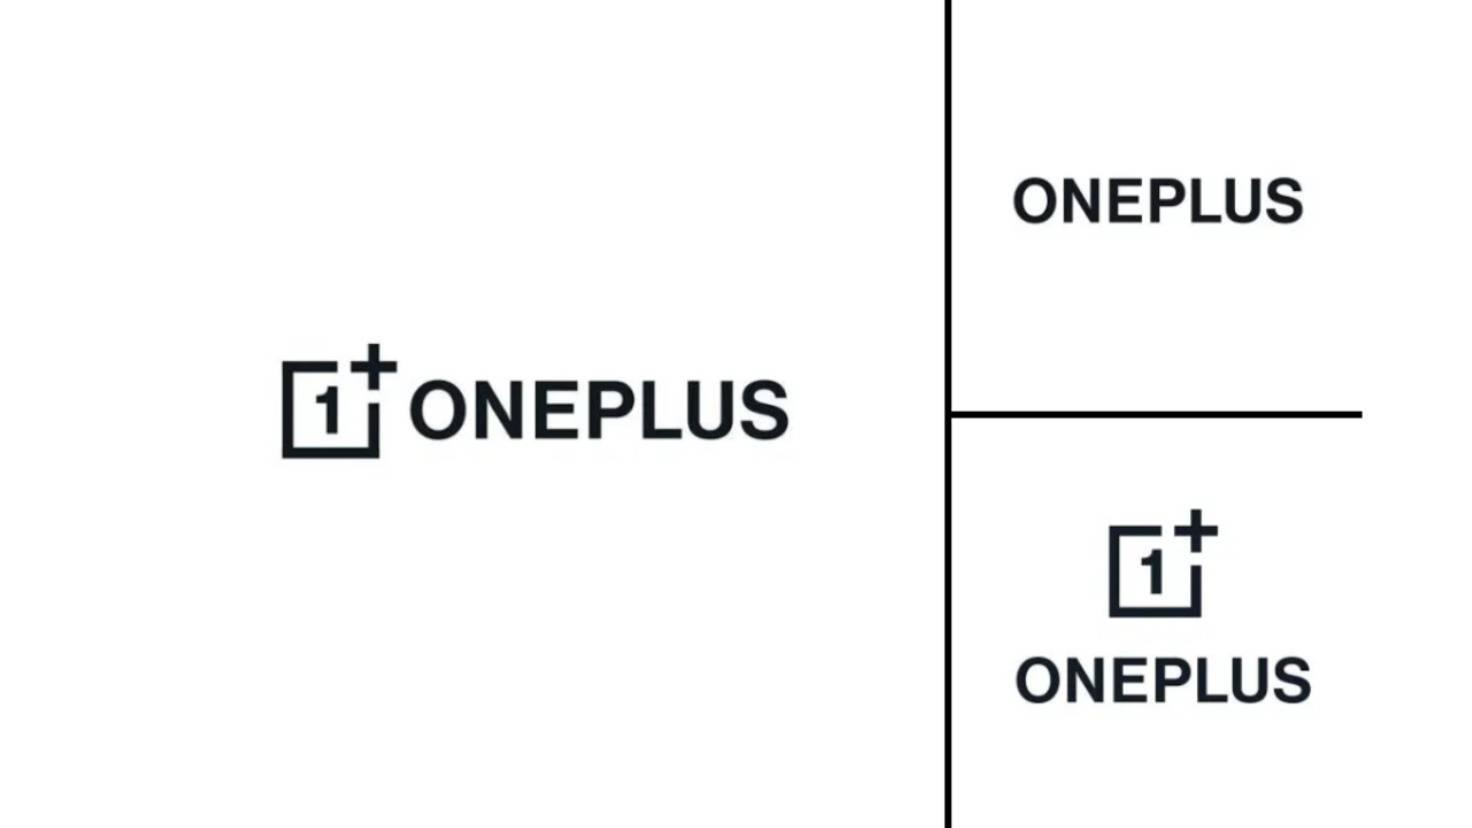 oneplus neues logo